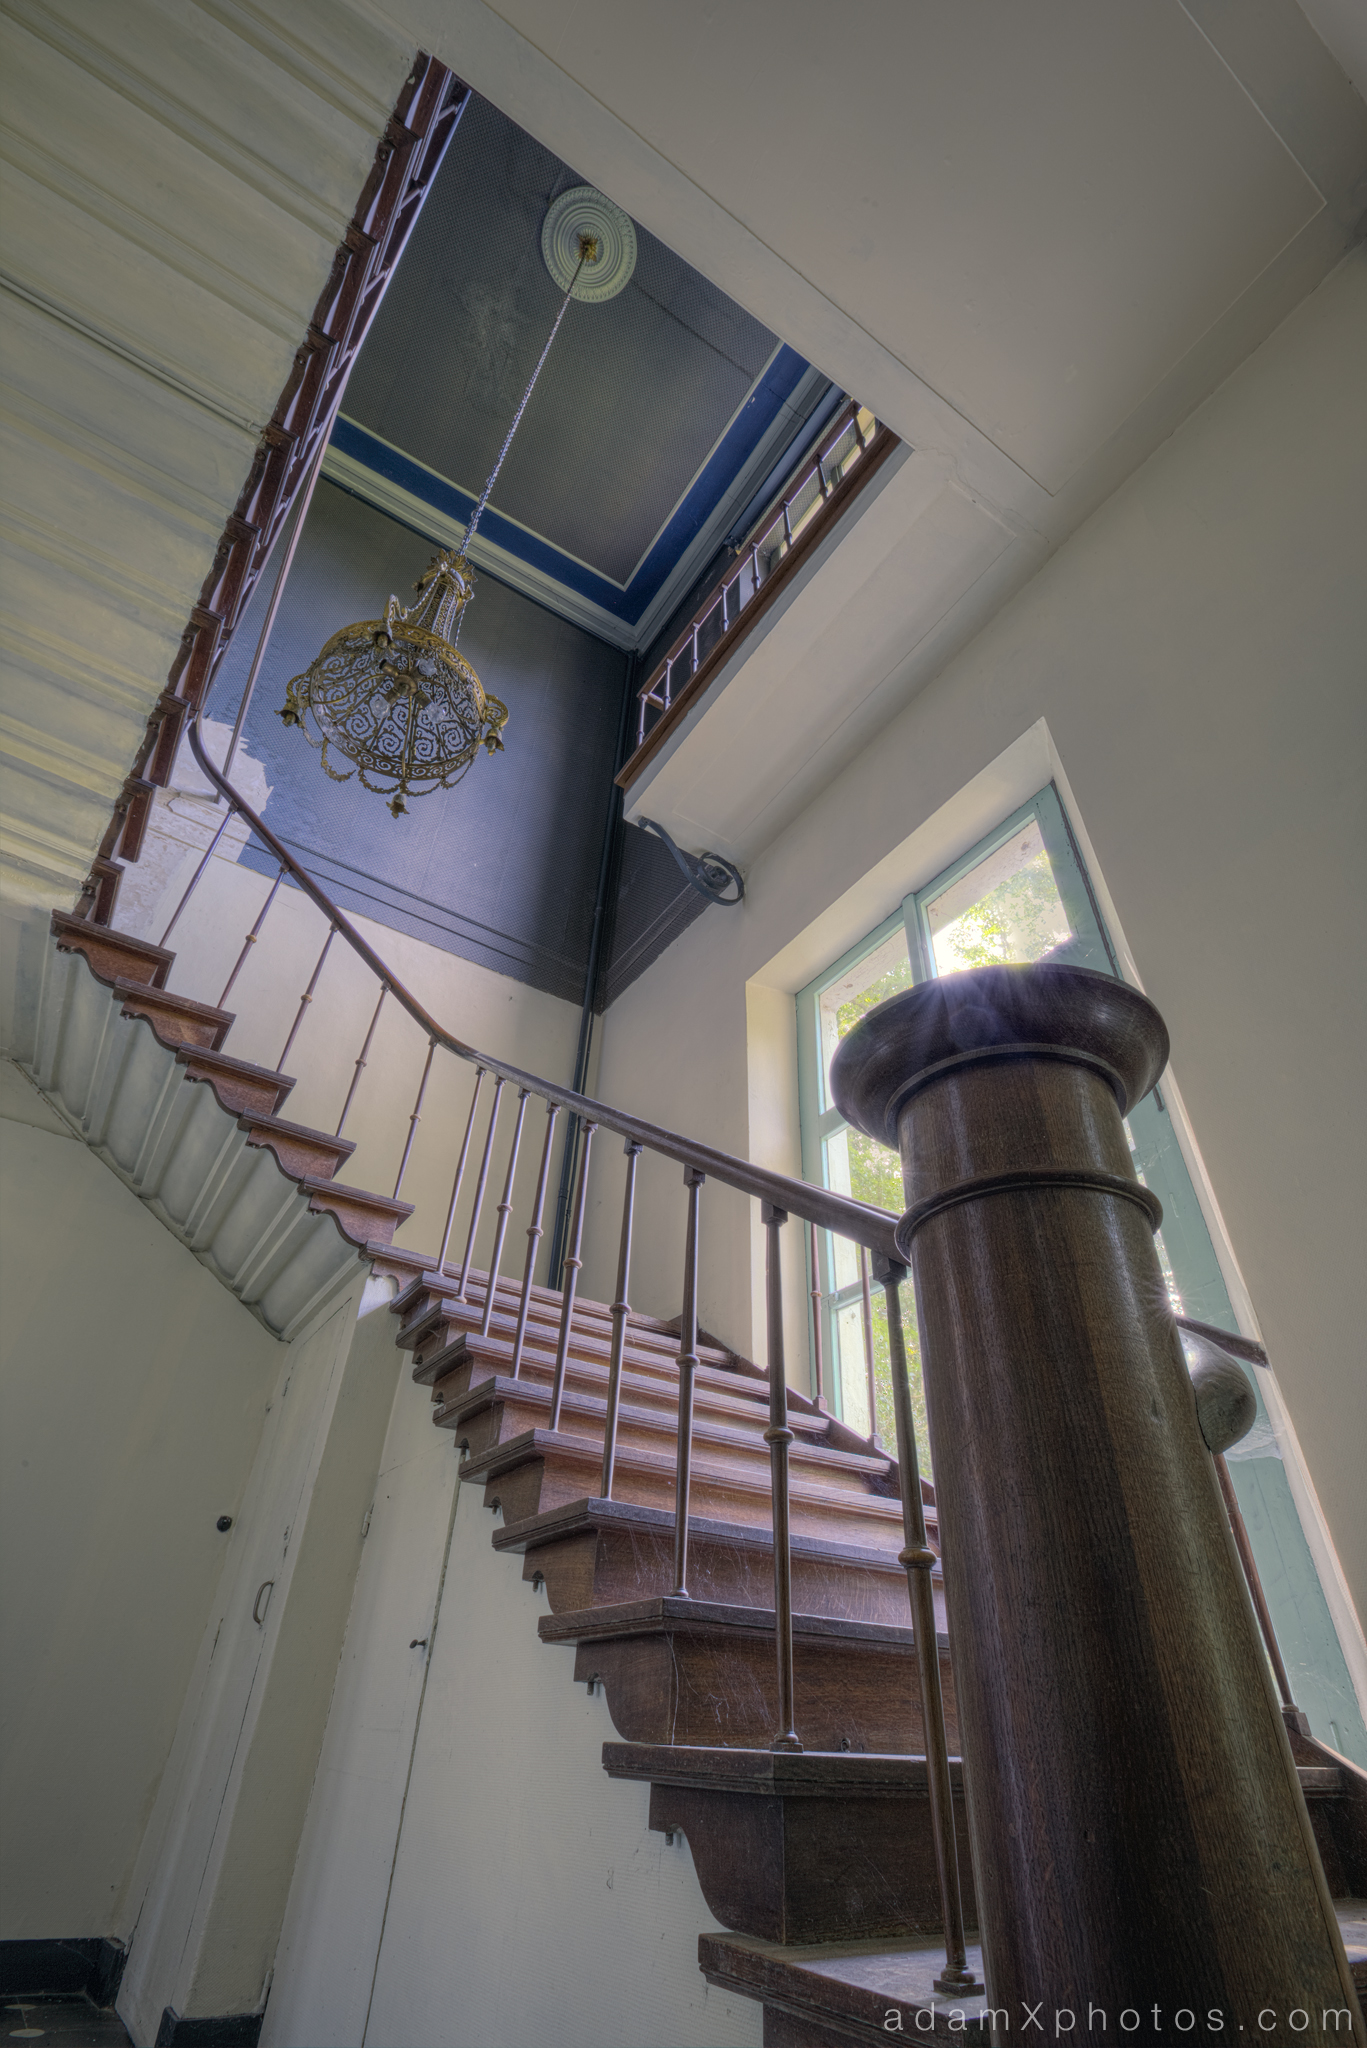 adam x chateau de la chapelle urbex urban exploration belgium abandoned stairs staircase bannisters balustrade chateau de la chapelle belgium